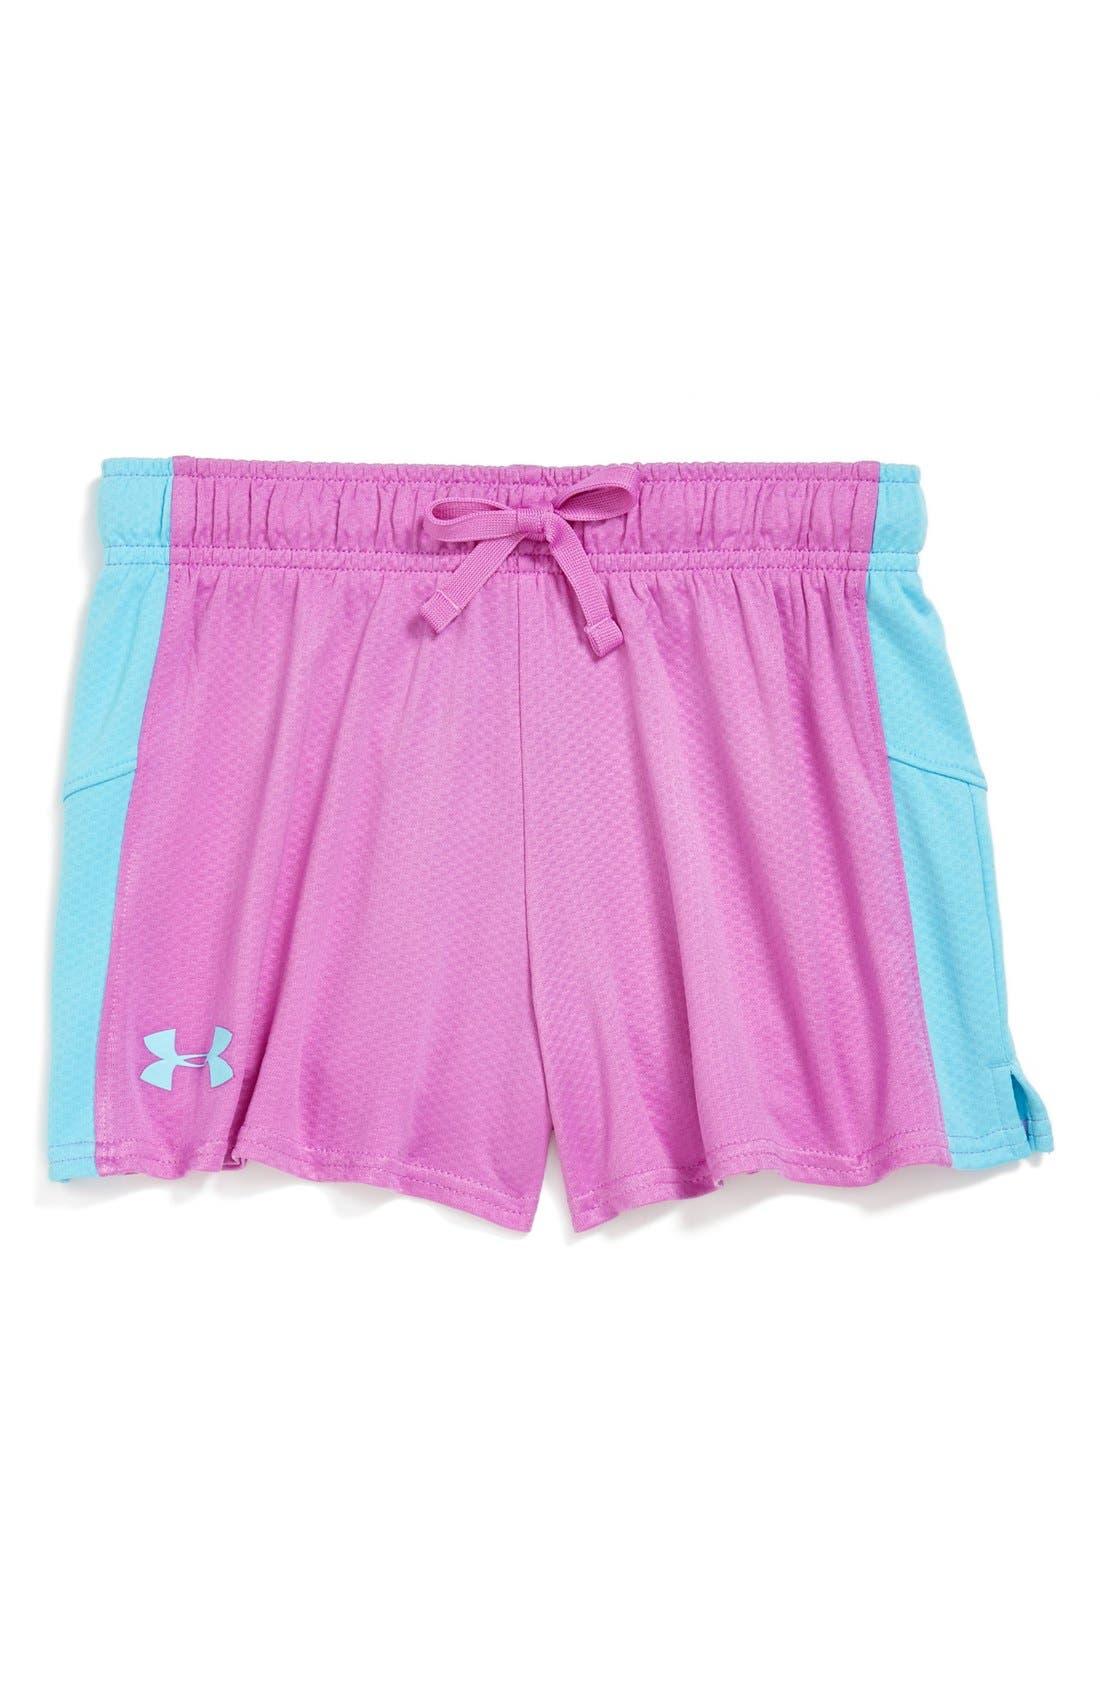 Alternate Image 1 Selected - Under Armour 'Intensity' HeatGear® Shorts (Big Girls)